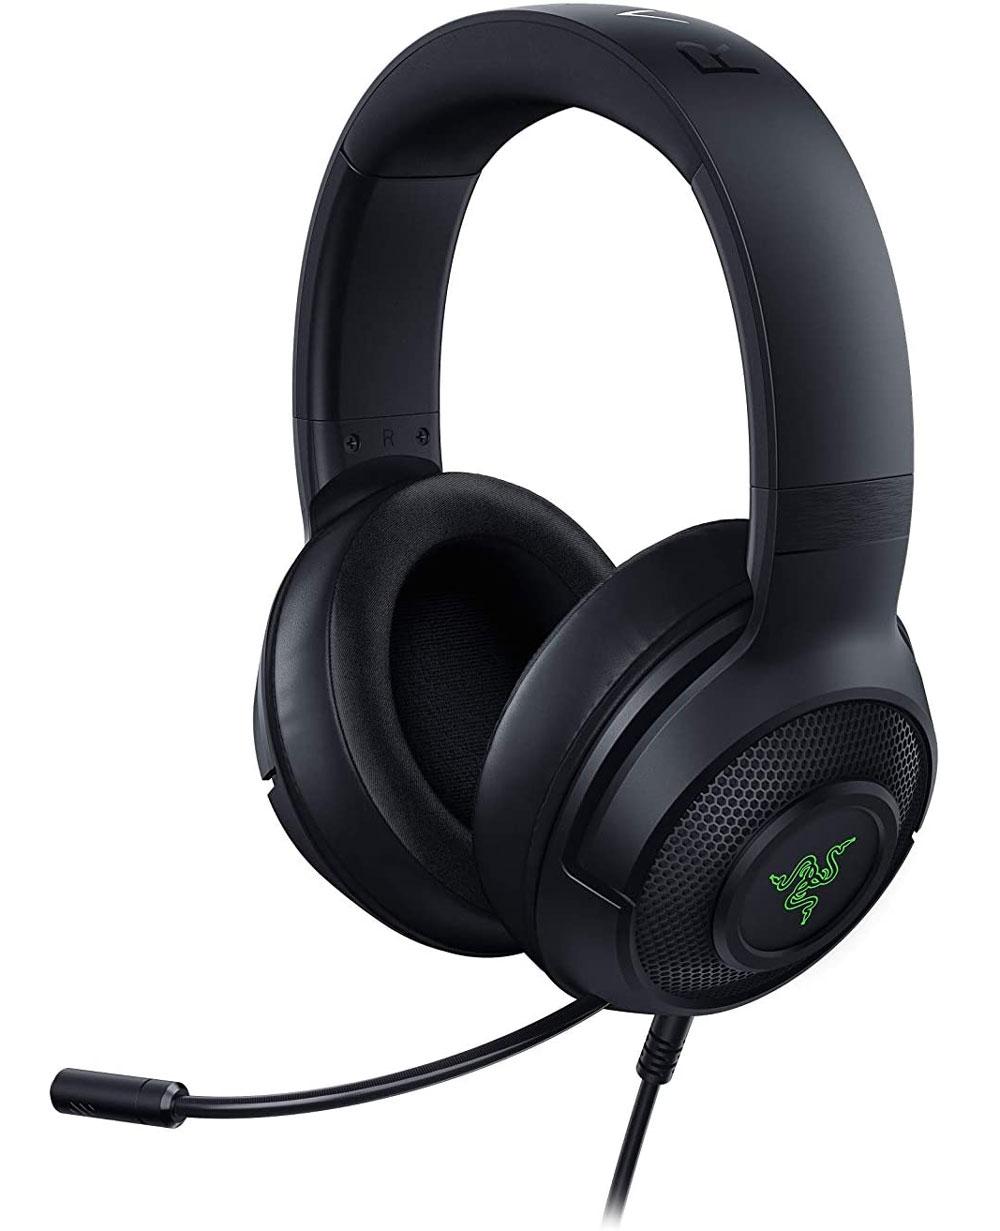 Razer Kraken V3 X Wired USB Gaming Headset